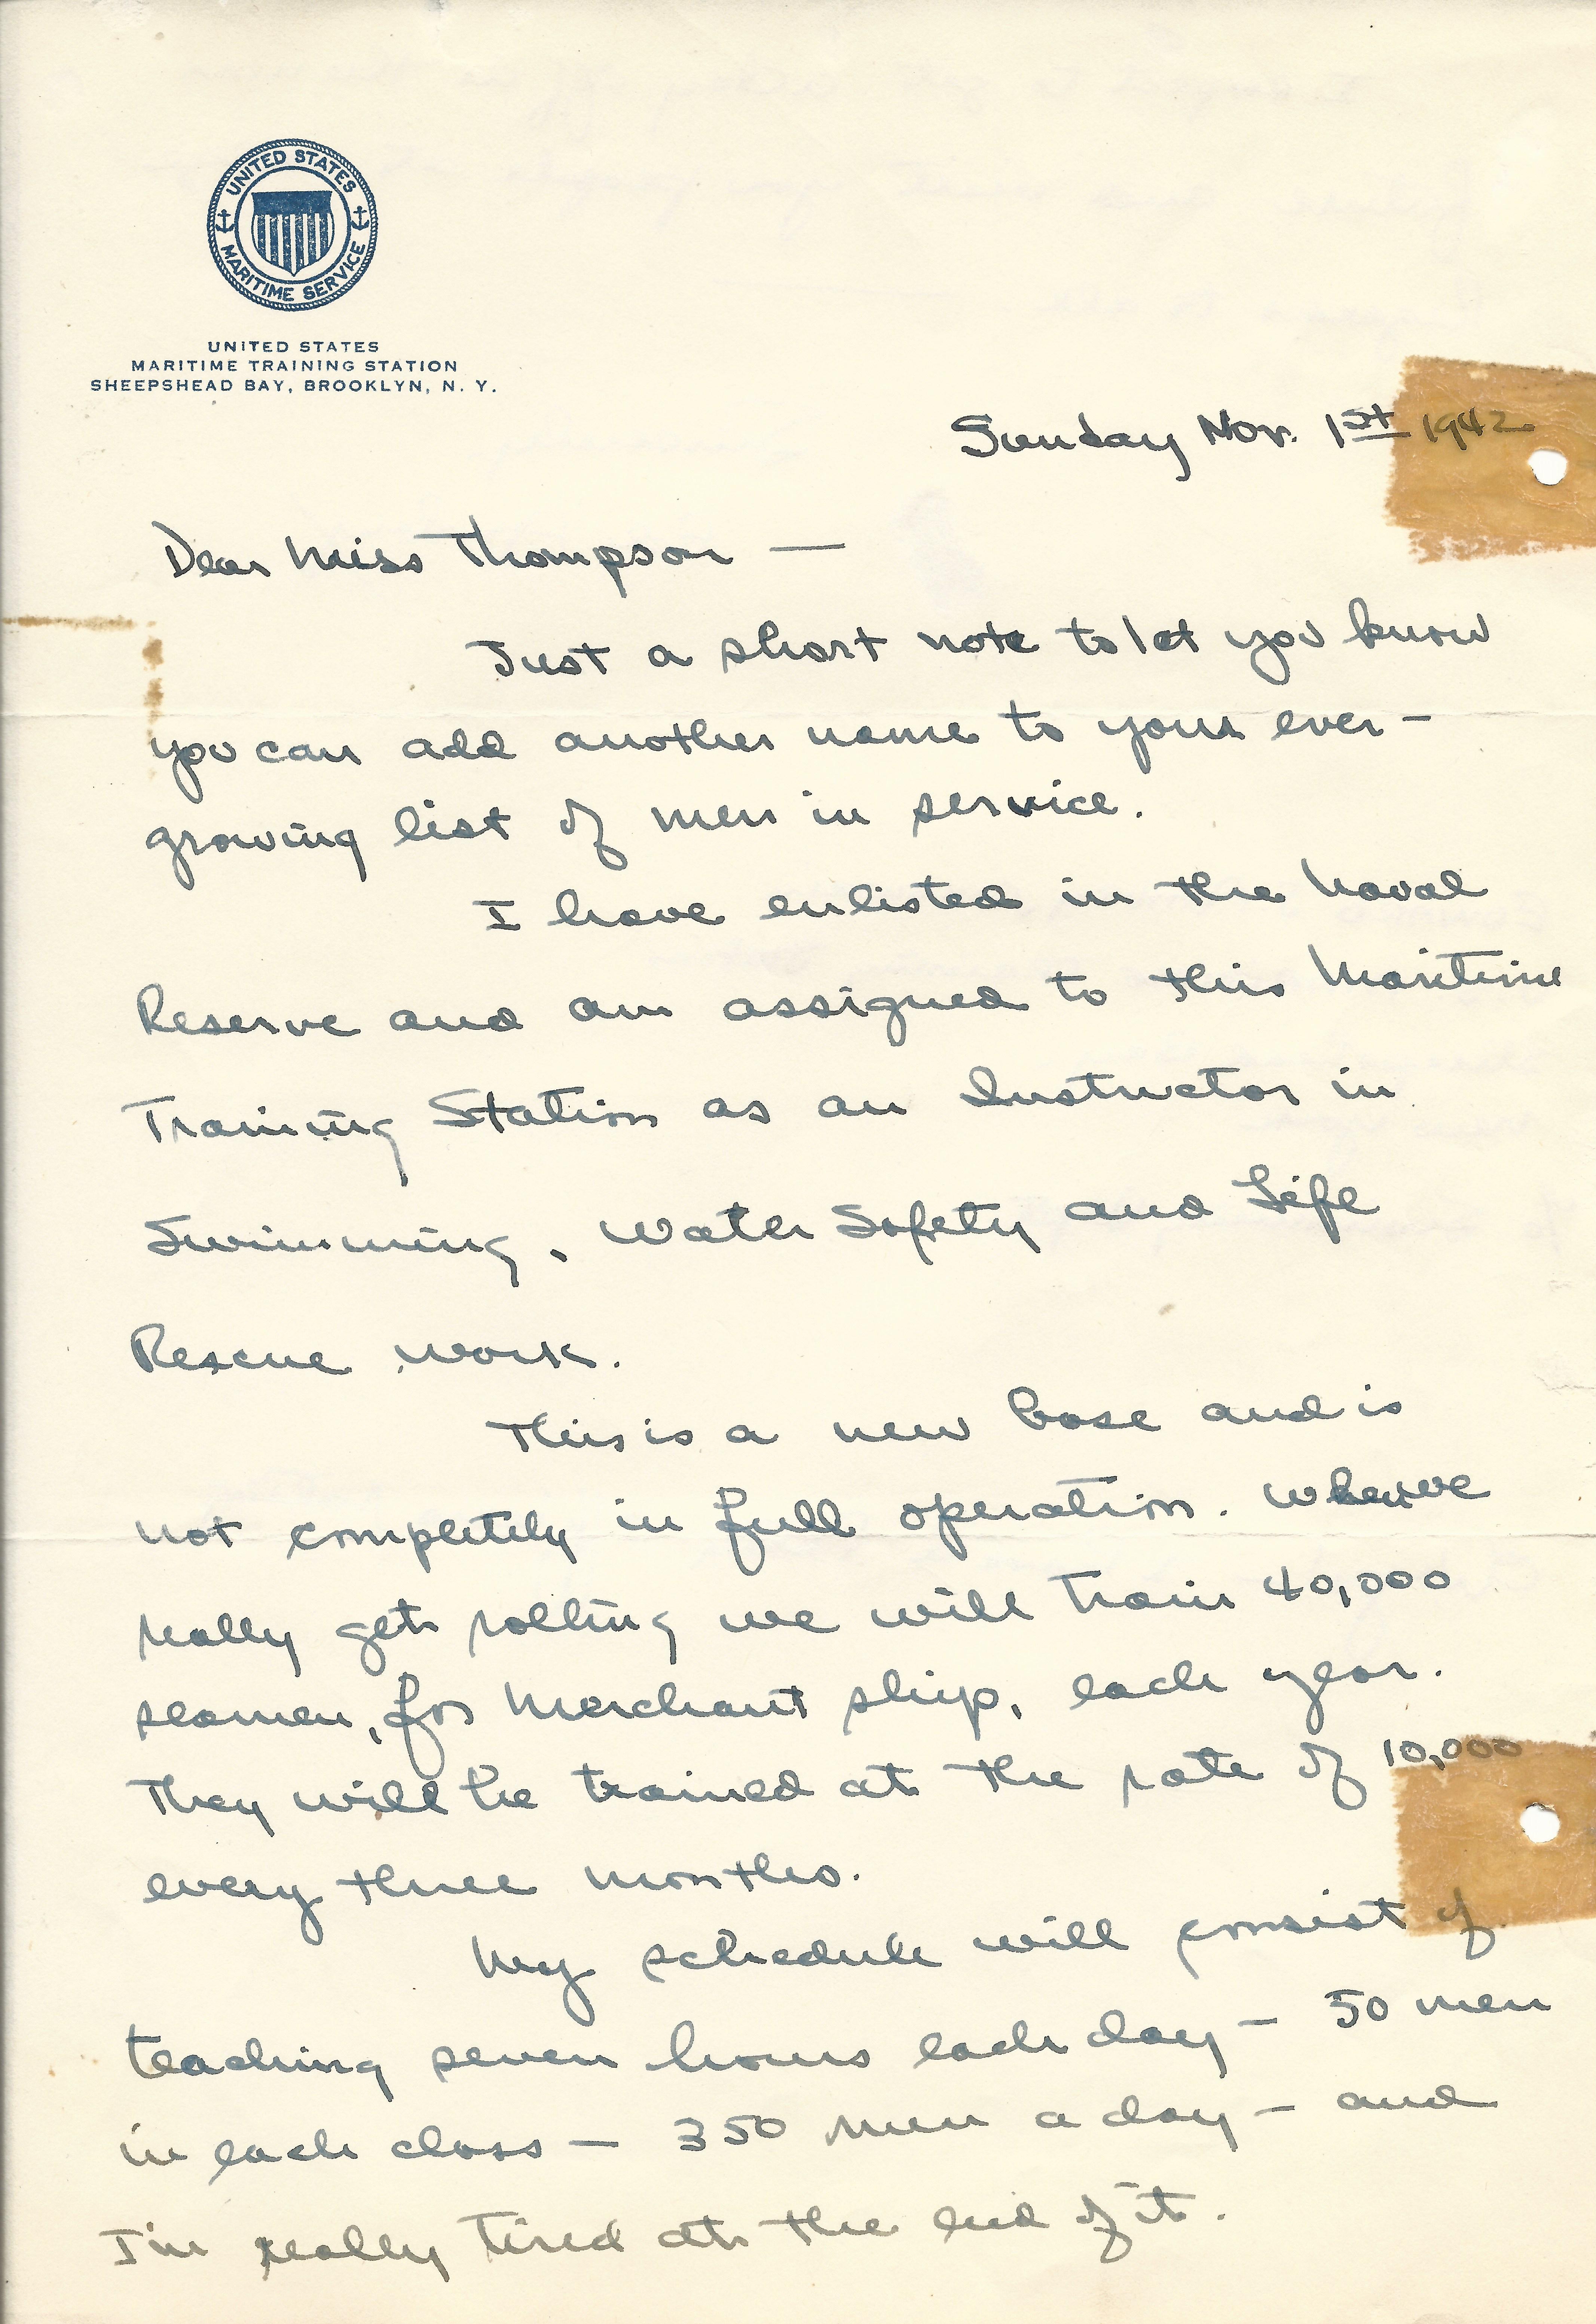 Edward Ambry November 1 1942